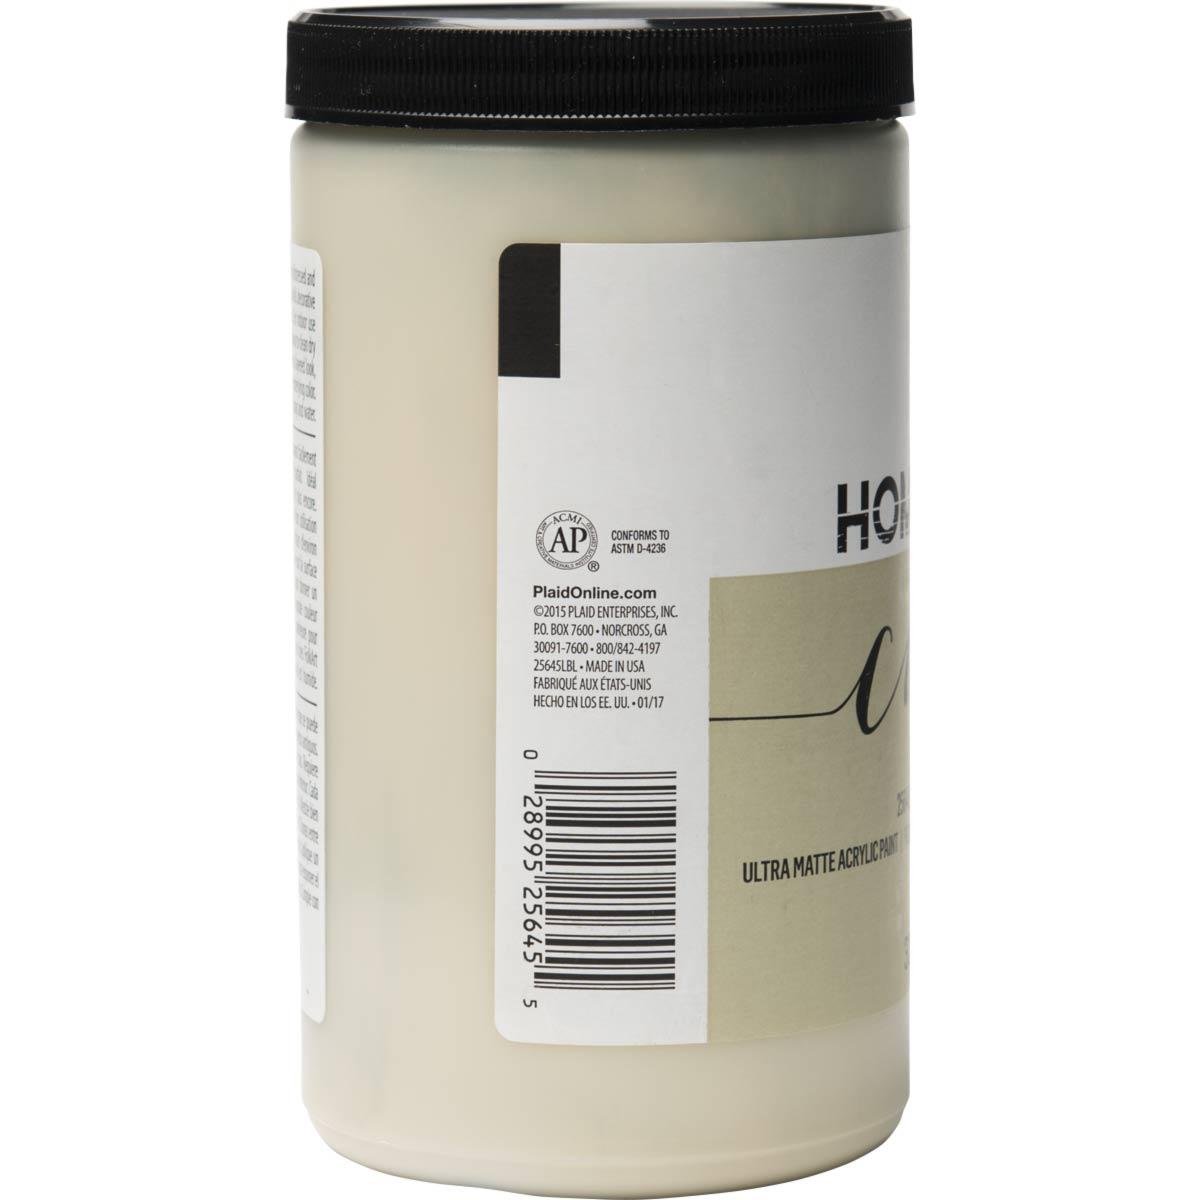 FolkArt ® Home Decor™ Chalk - Oatmeal, 32 oz.